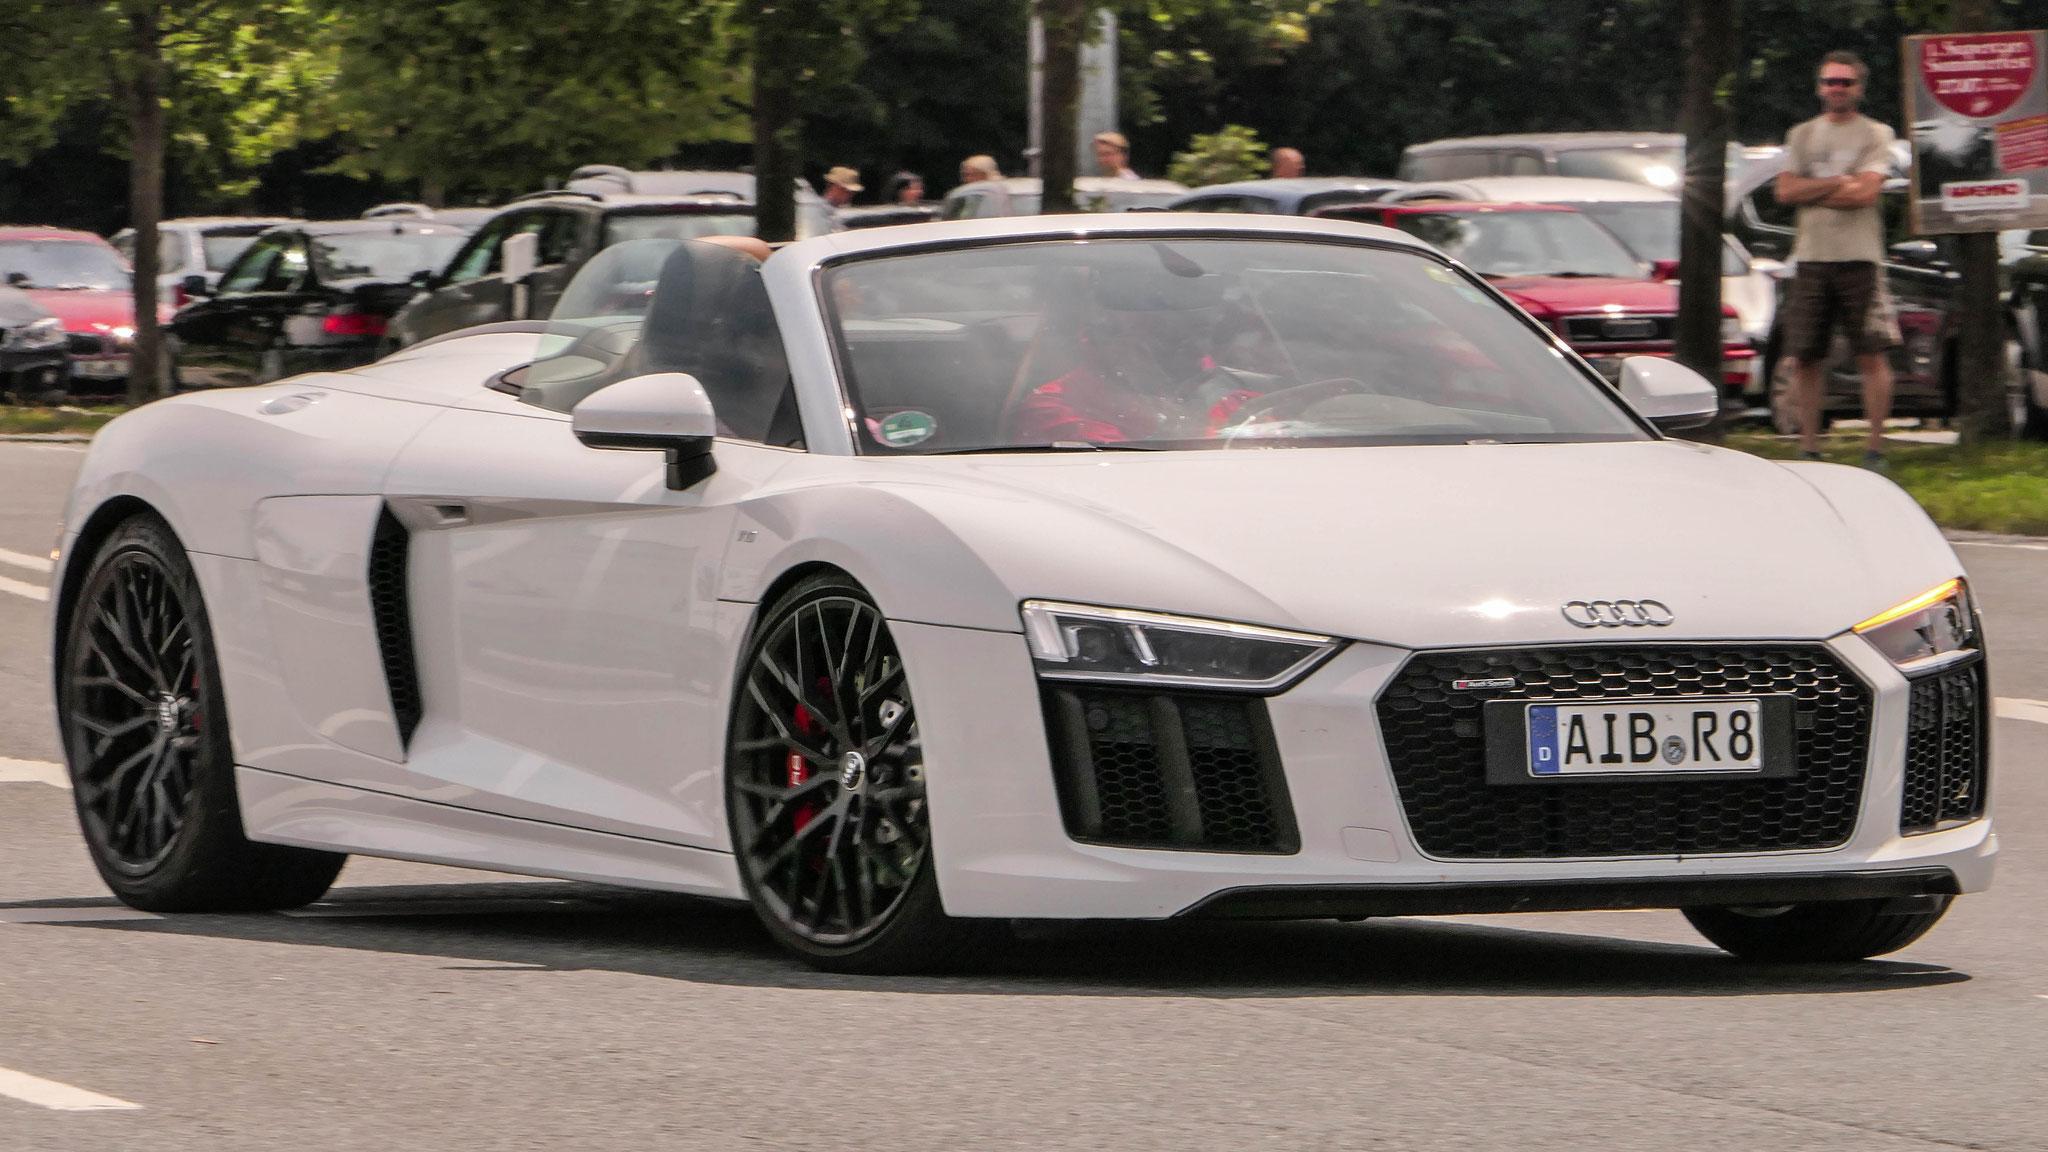 Audi R8 V10 Spyder - AIB-R-8